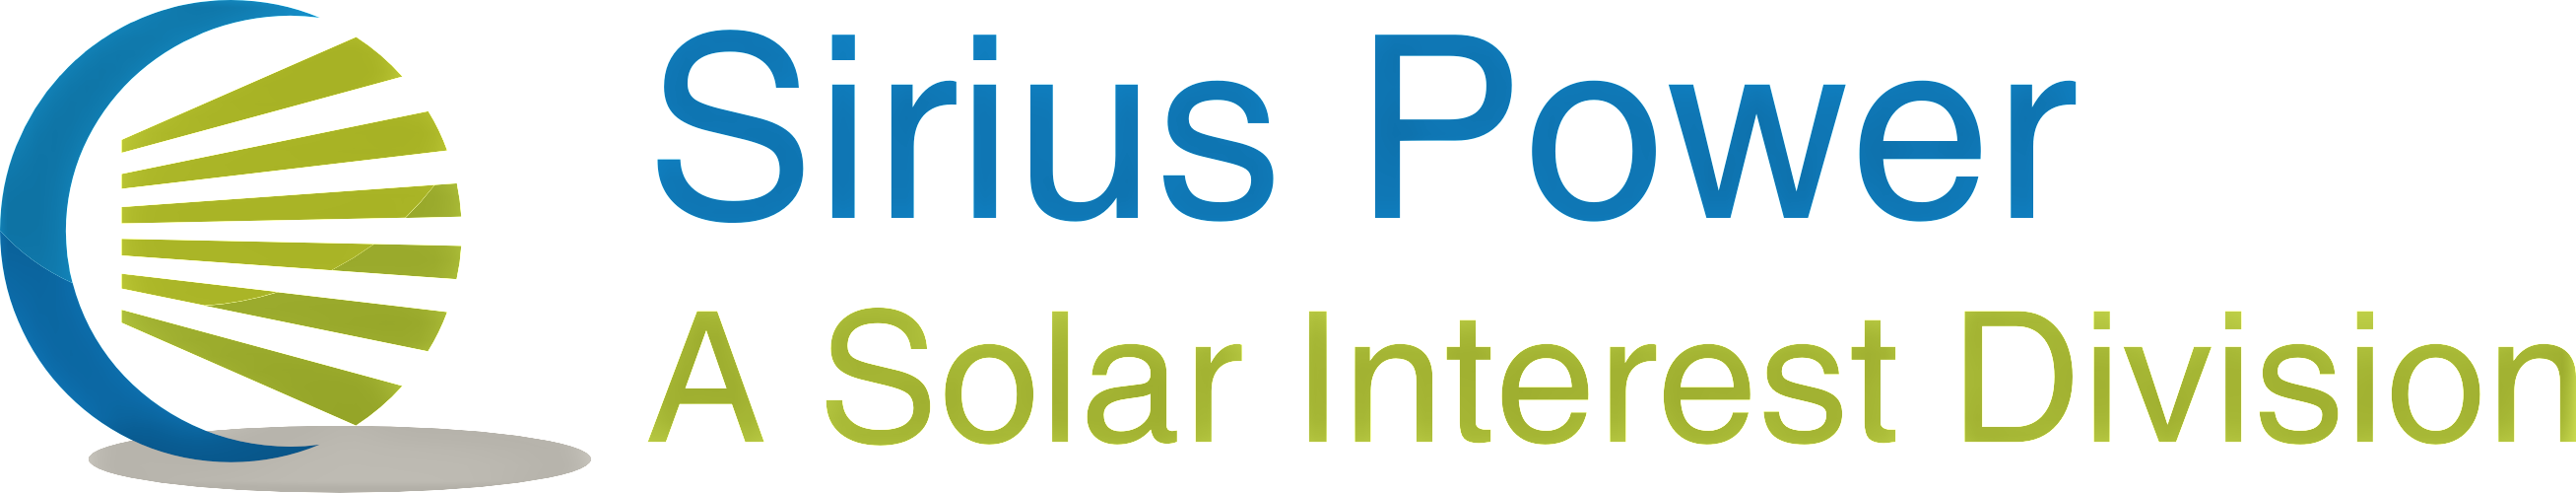 ANDERTECH INC / SOLAR INTEREST